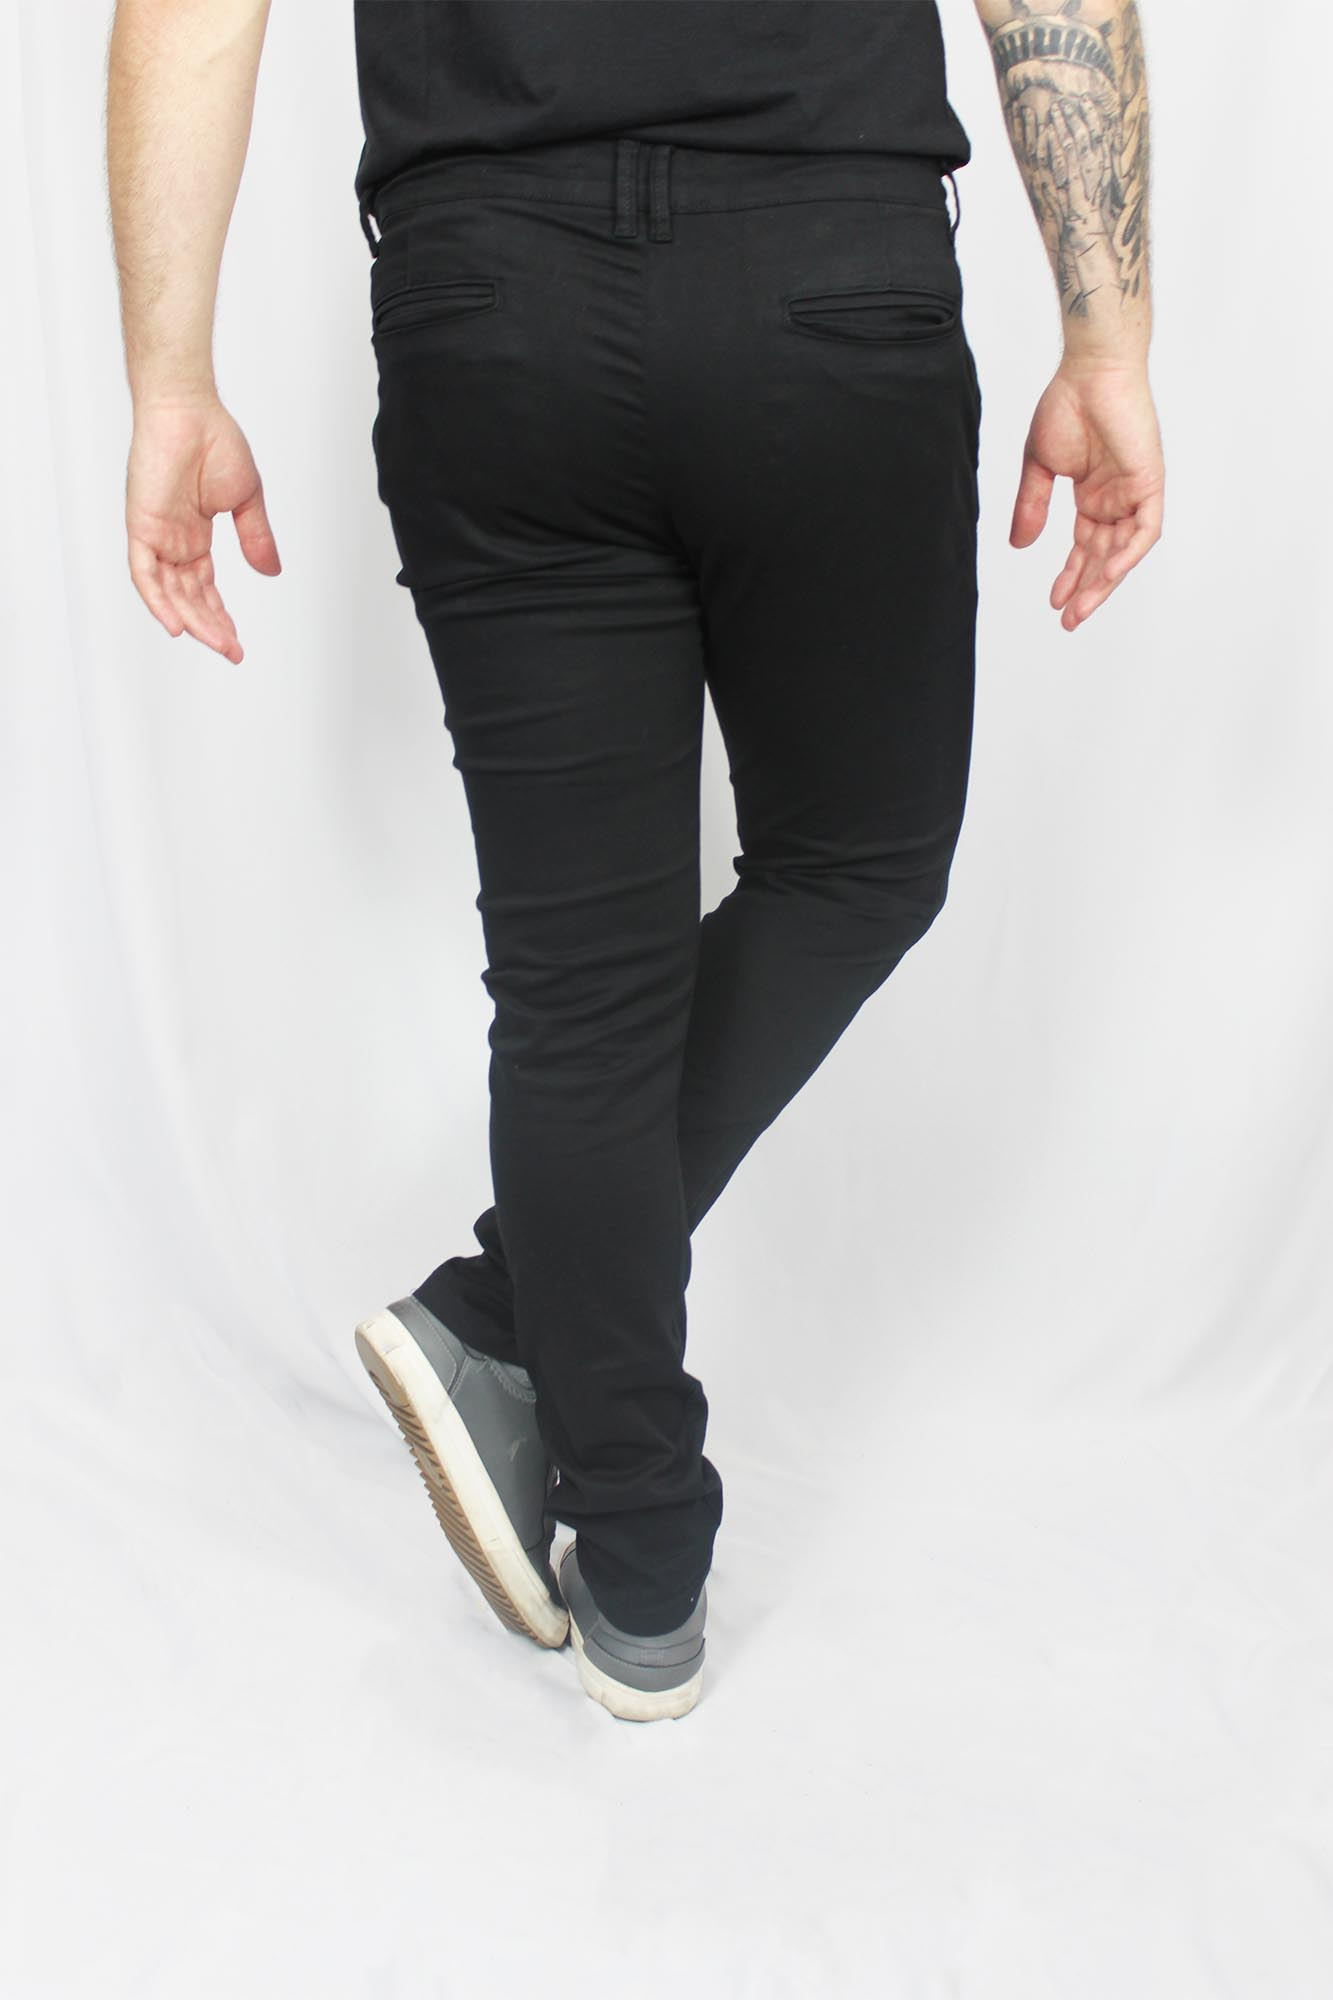 Calça Alfaiataria de Sarja Slim Lisa com Elastano Masculina - Preta